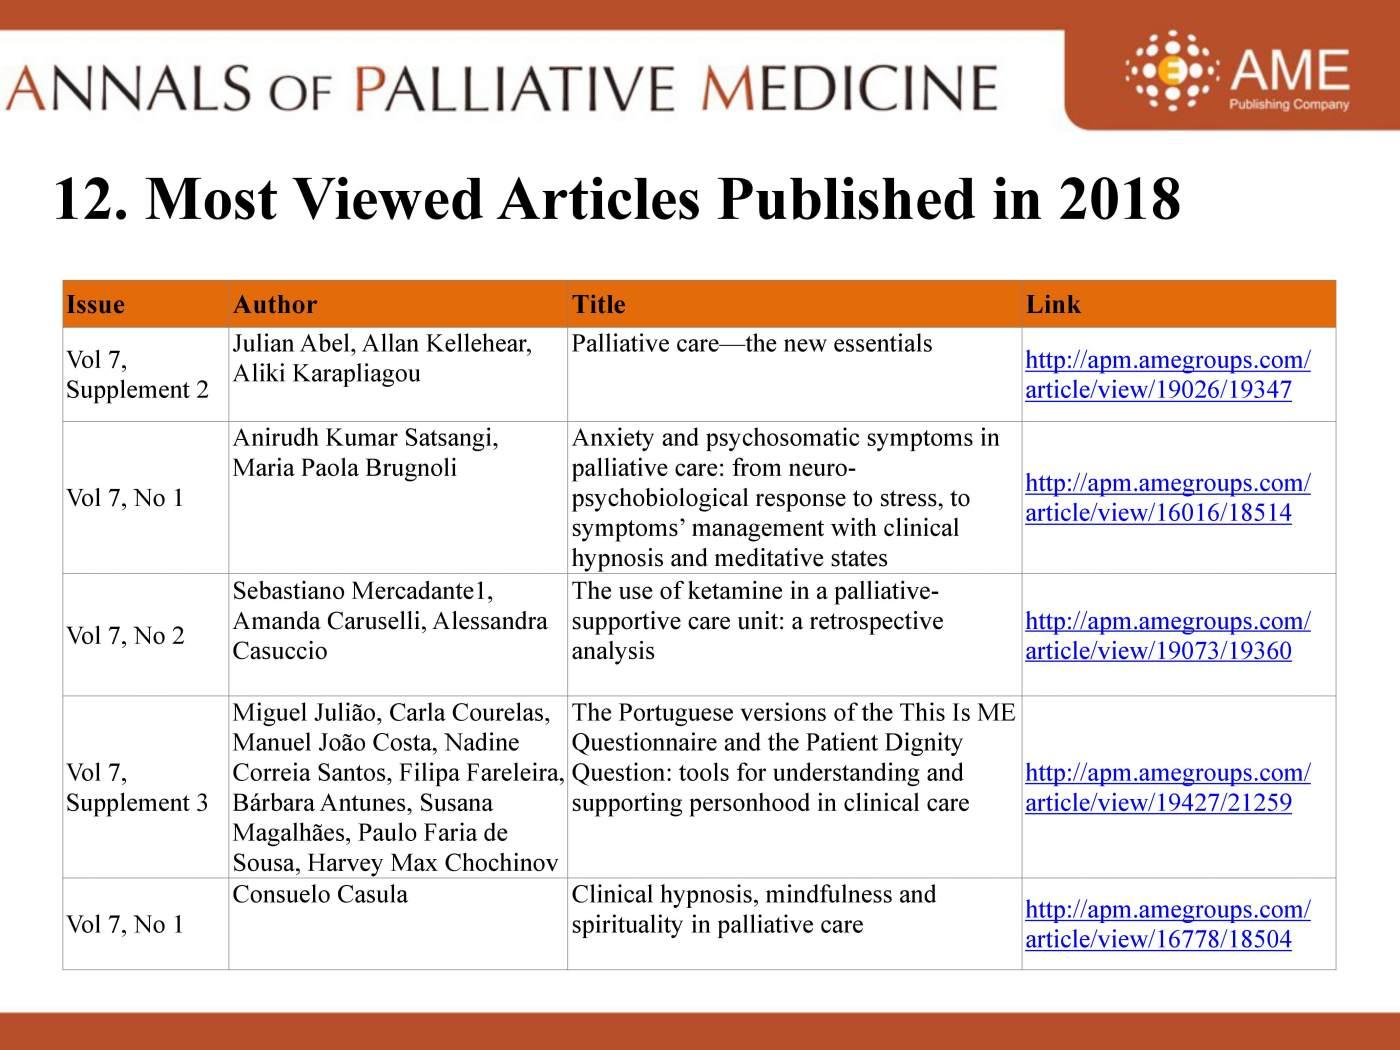 2018 Annual Report of APM - Annals of Palliative Medicine